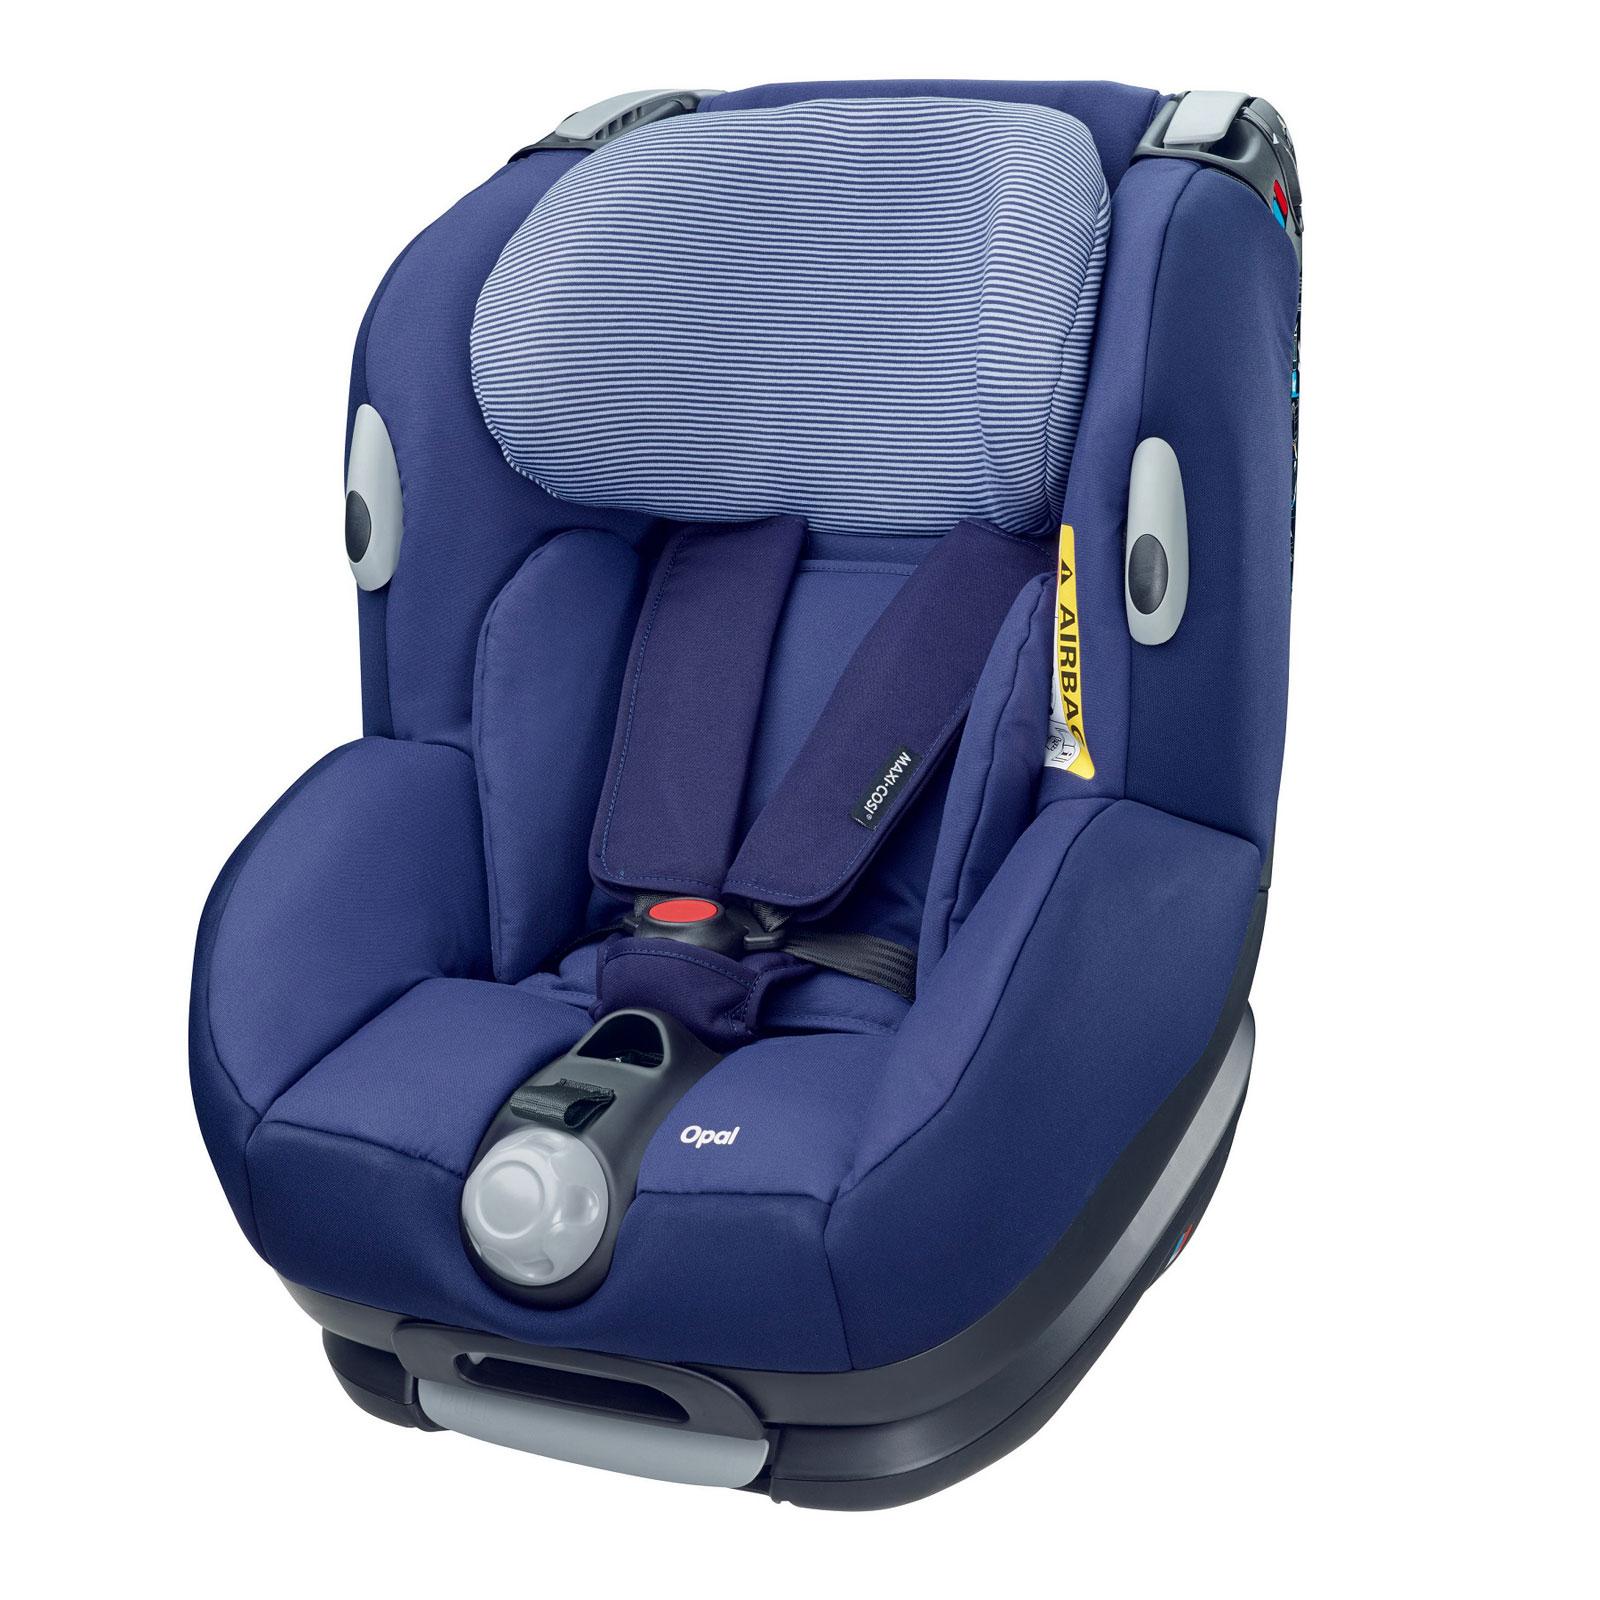 Автокресло Maxi-Cosi Opal River Blue<br>